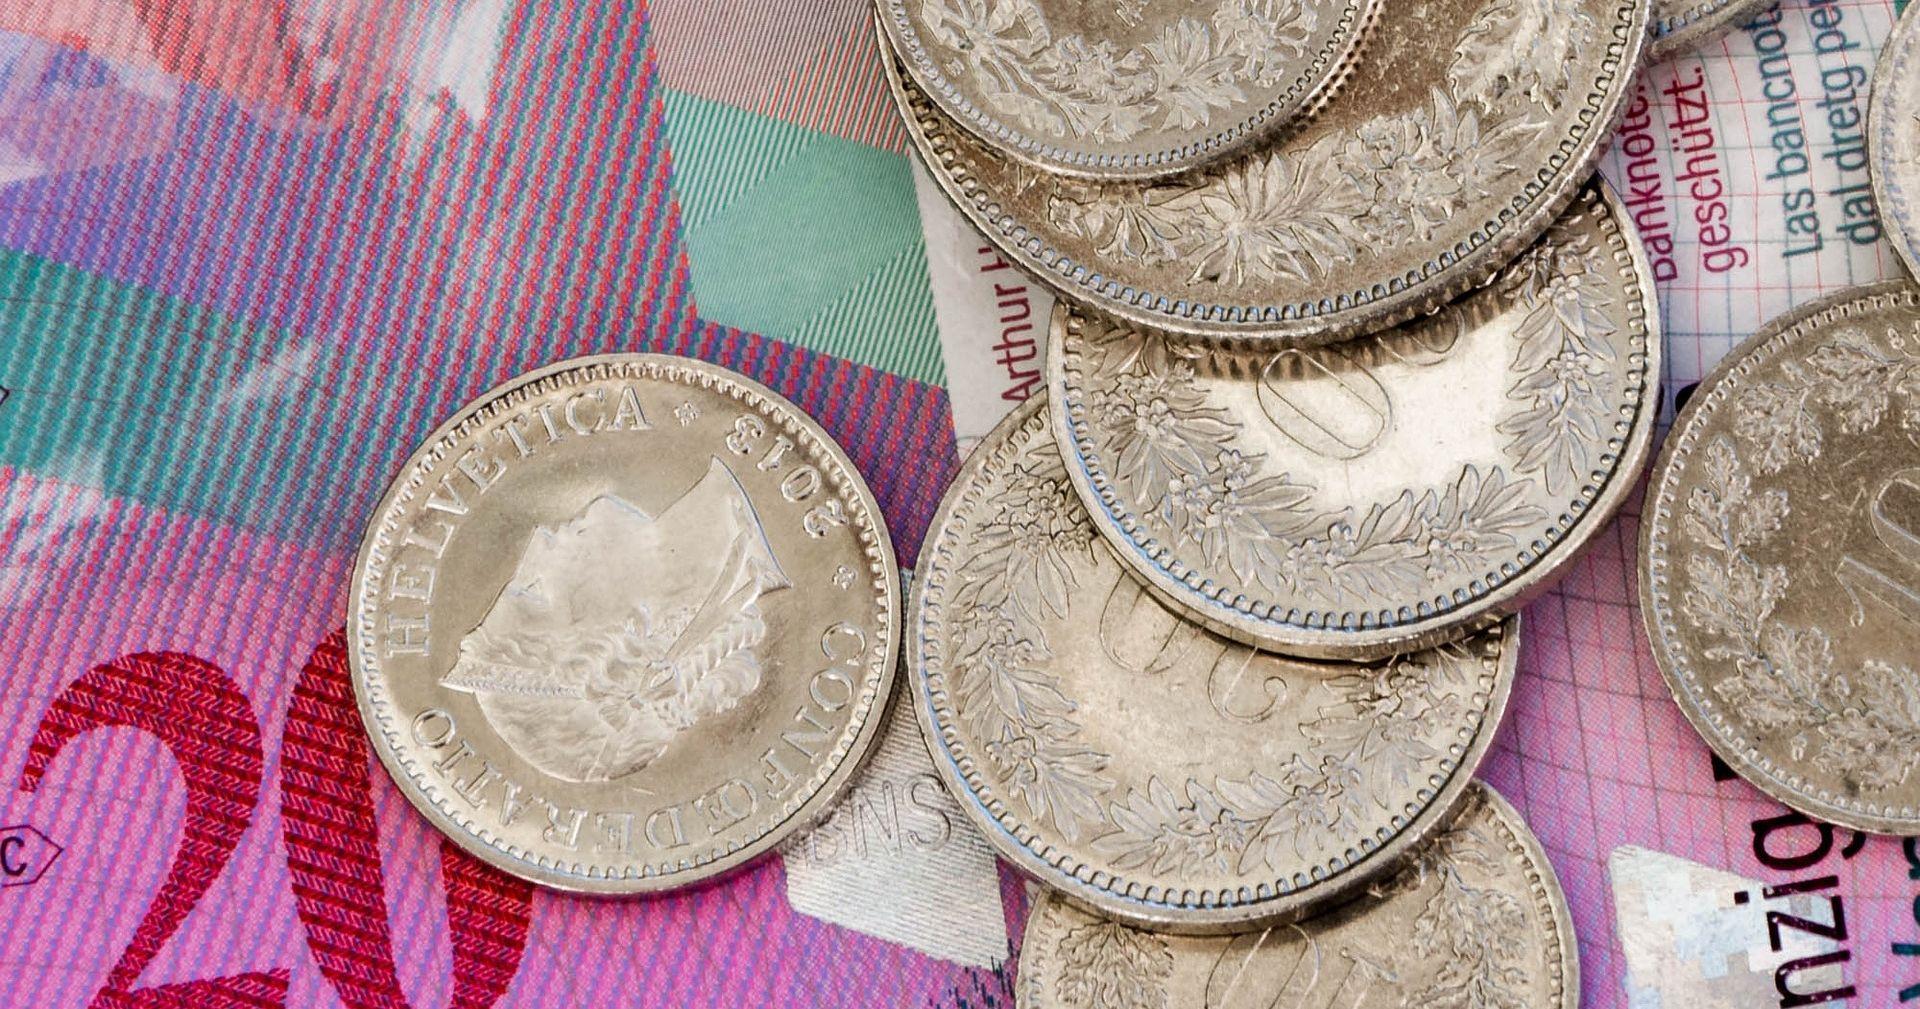 UDRUGA FRANAK Banke su morale upozoriti na rizike tečaja 'švicarca'